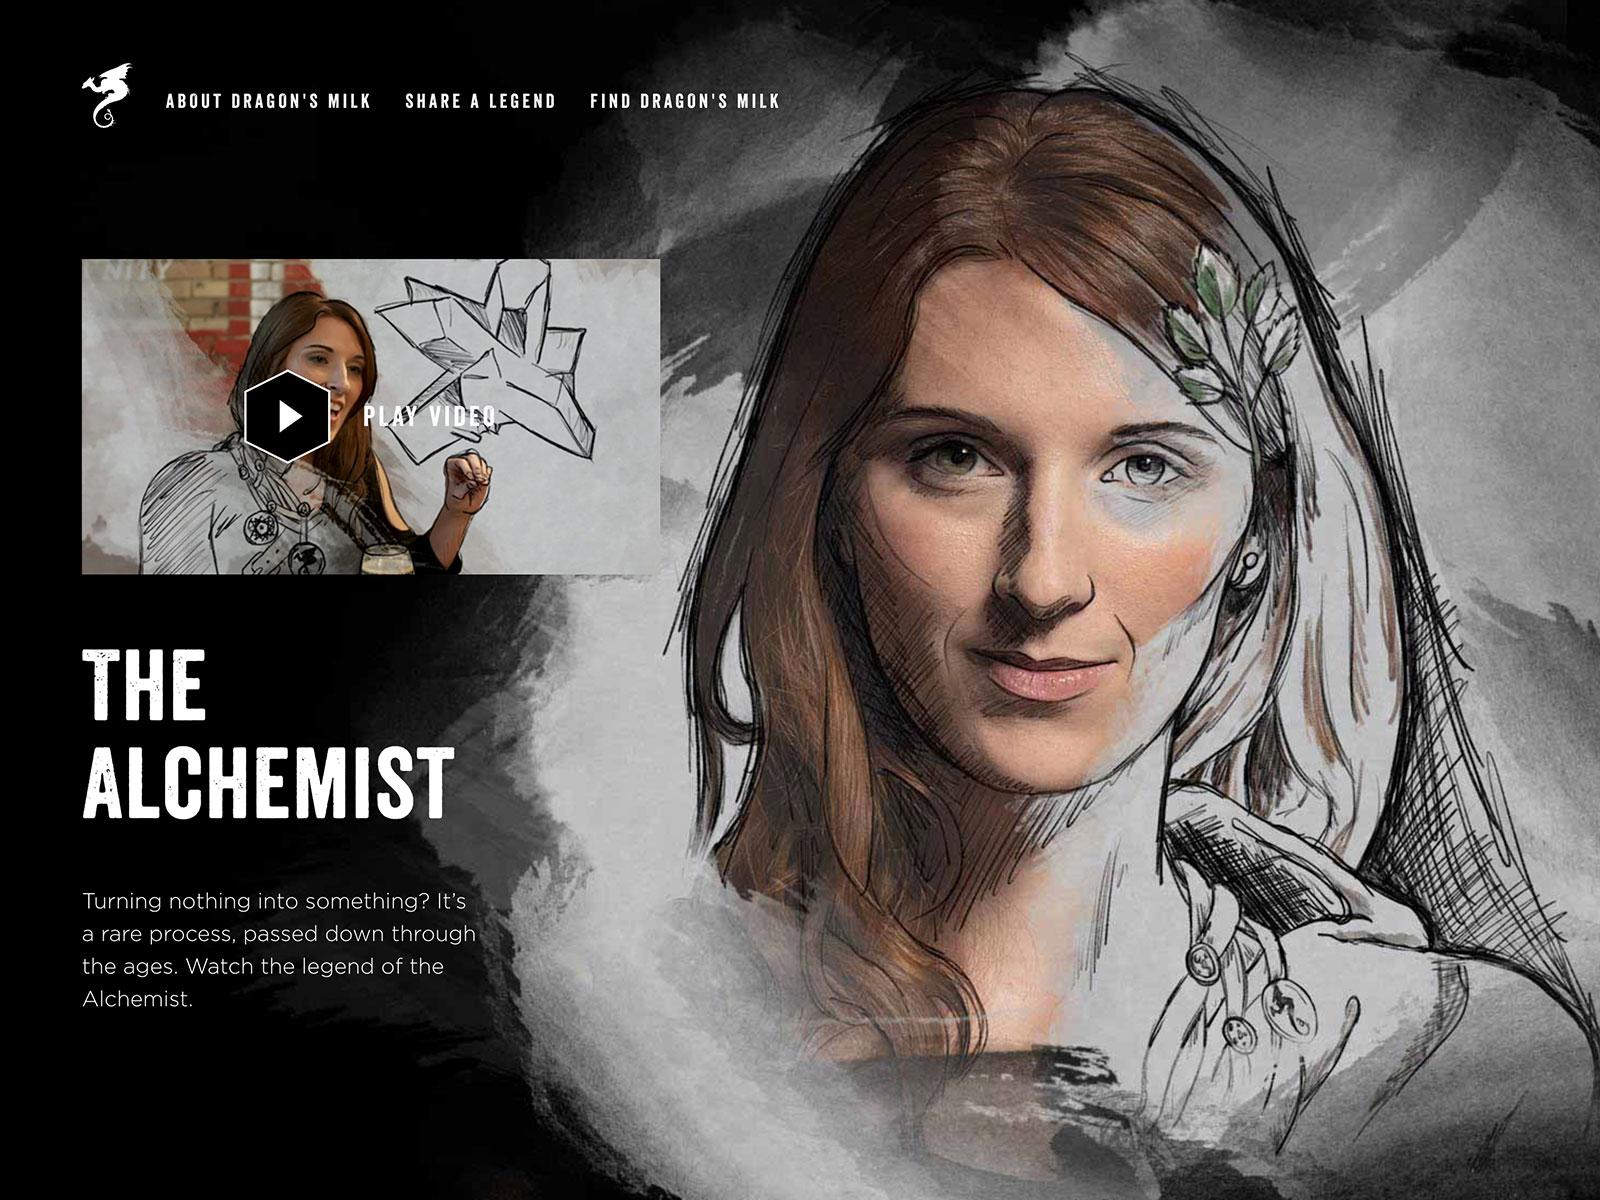 Dm alchemist